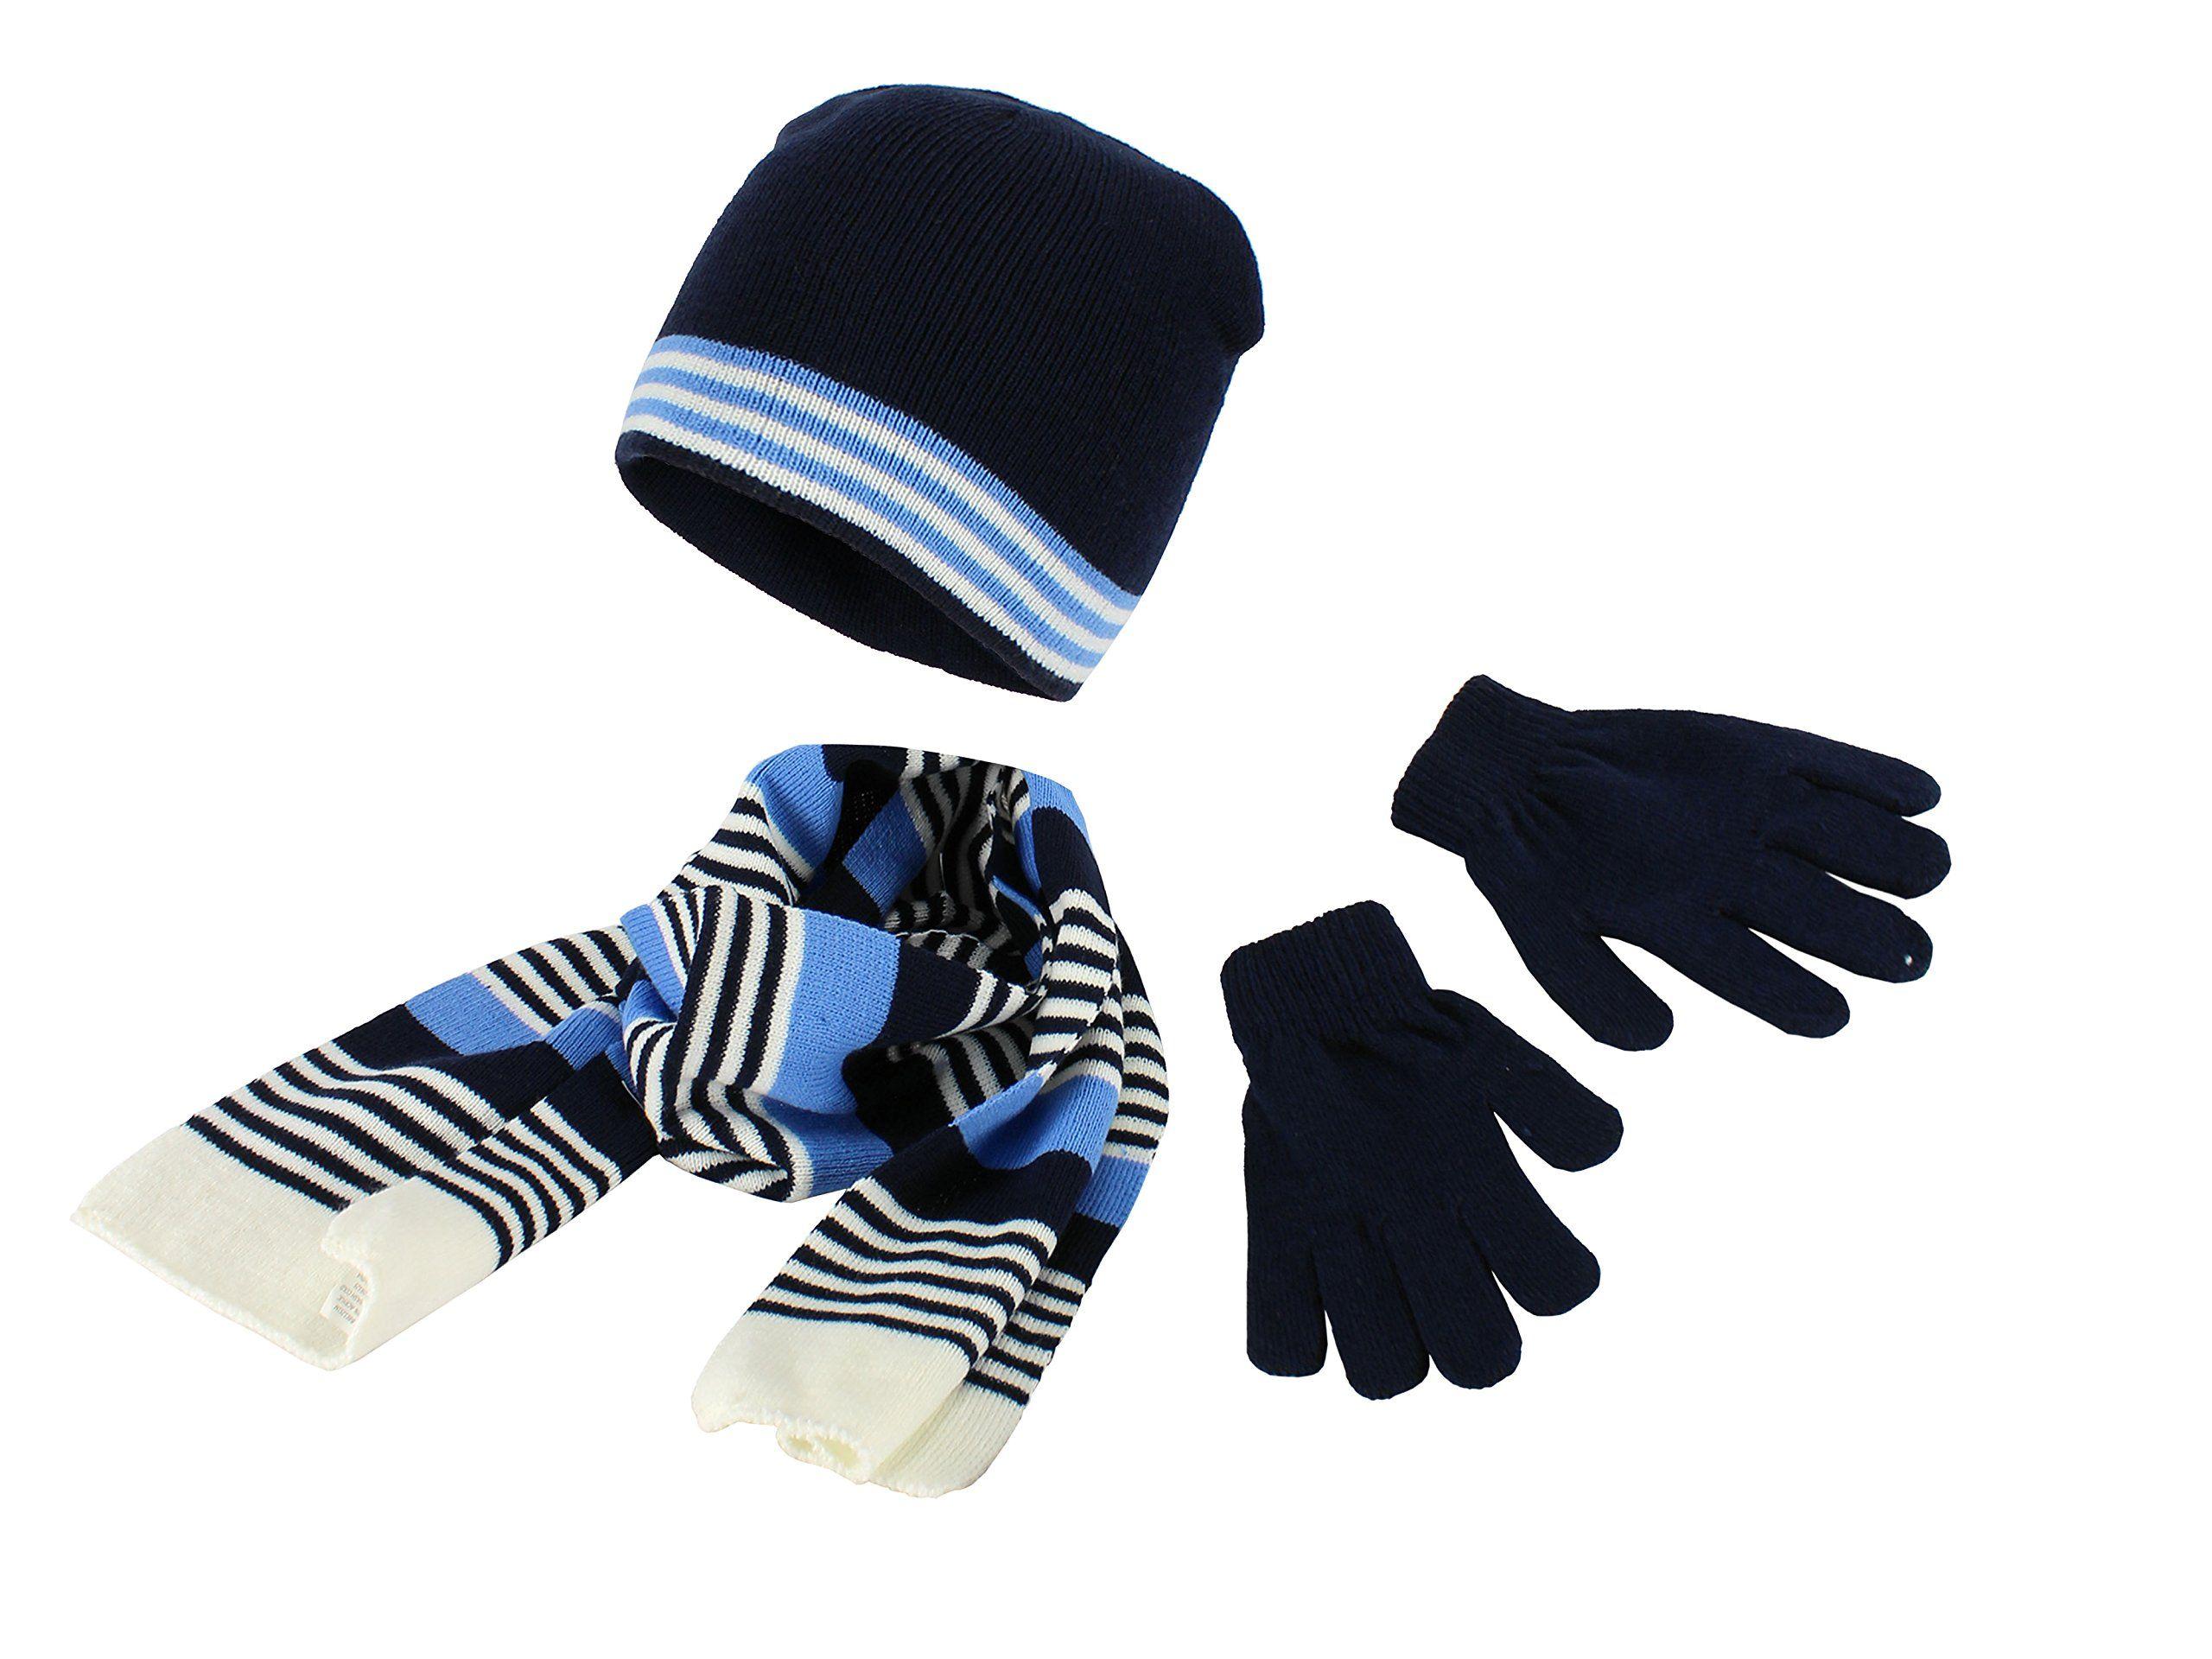 Navy Polar Wear Boys Knit Hat Scarf And Gloves Set